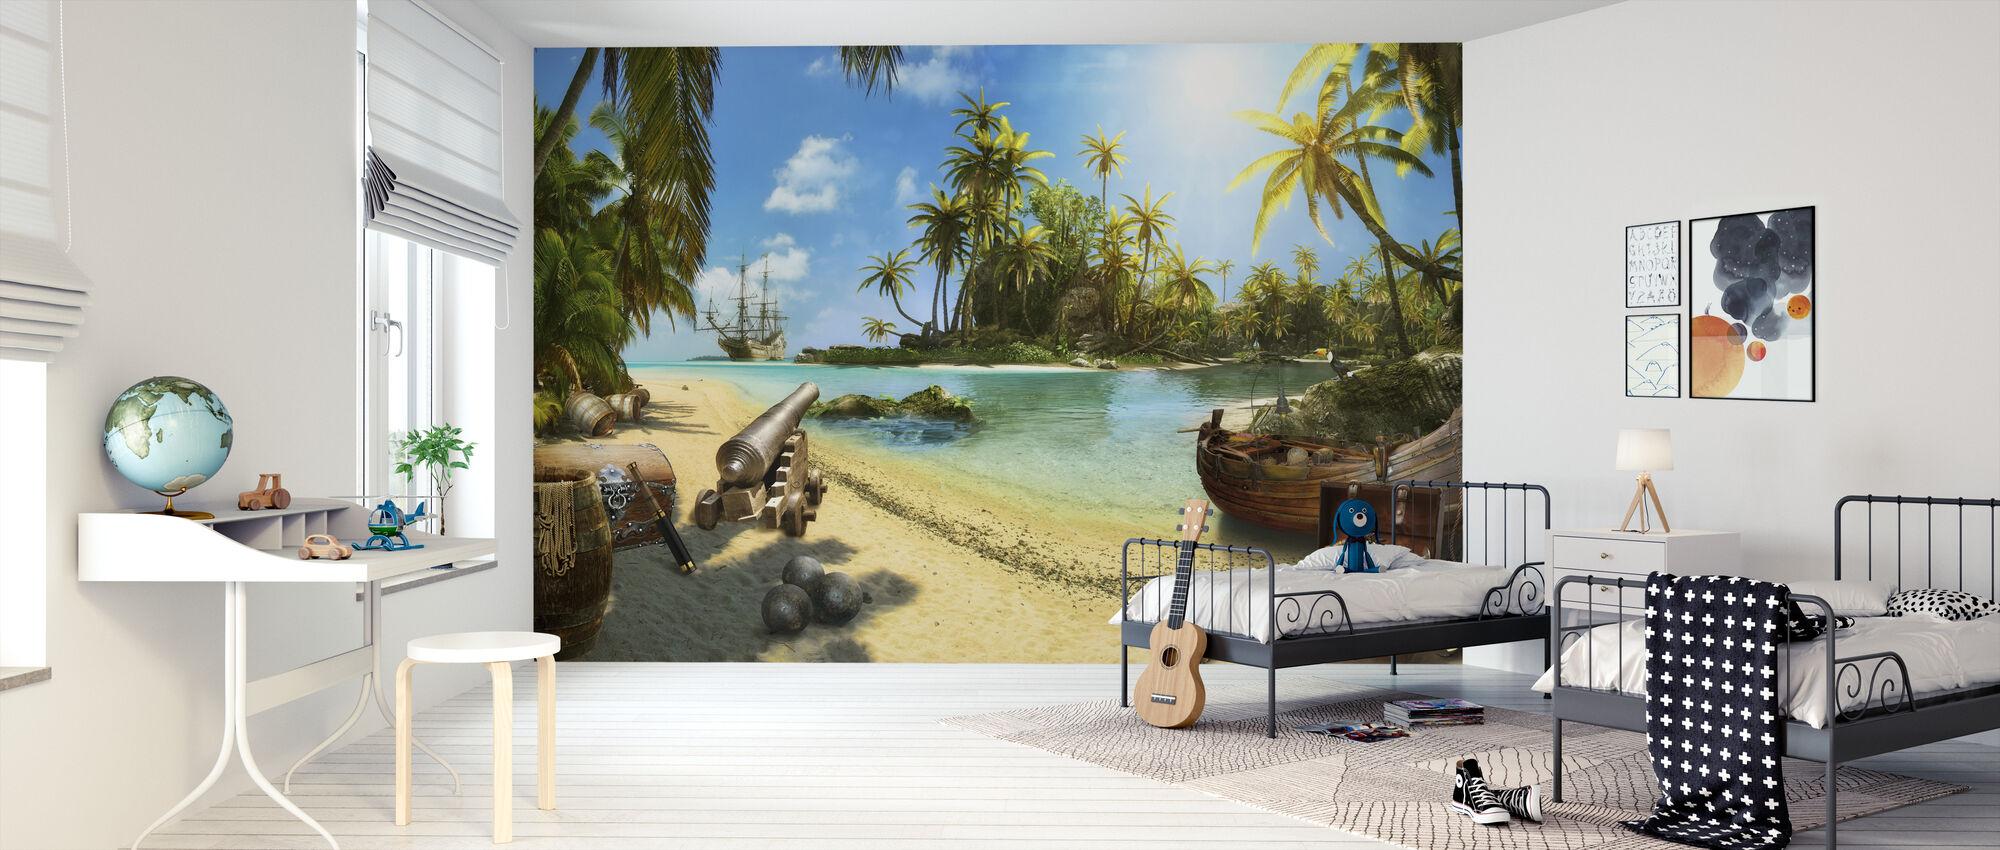 Pirateneiland - Behang - Kinderkamer